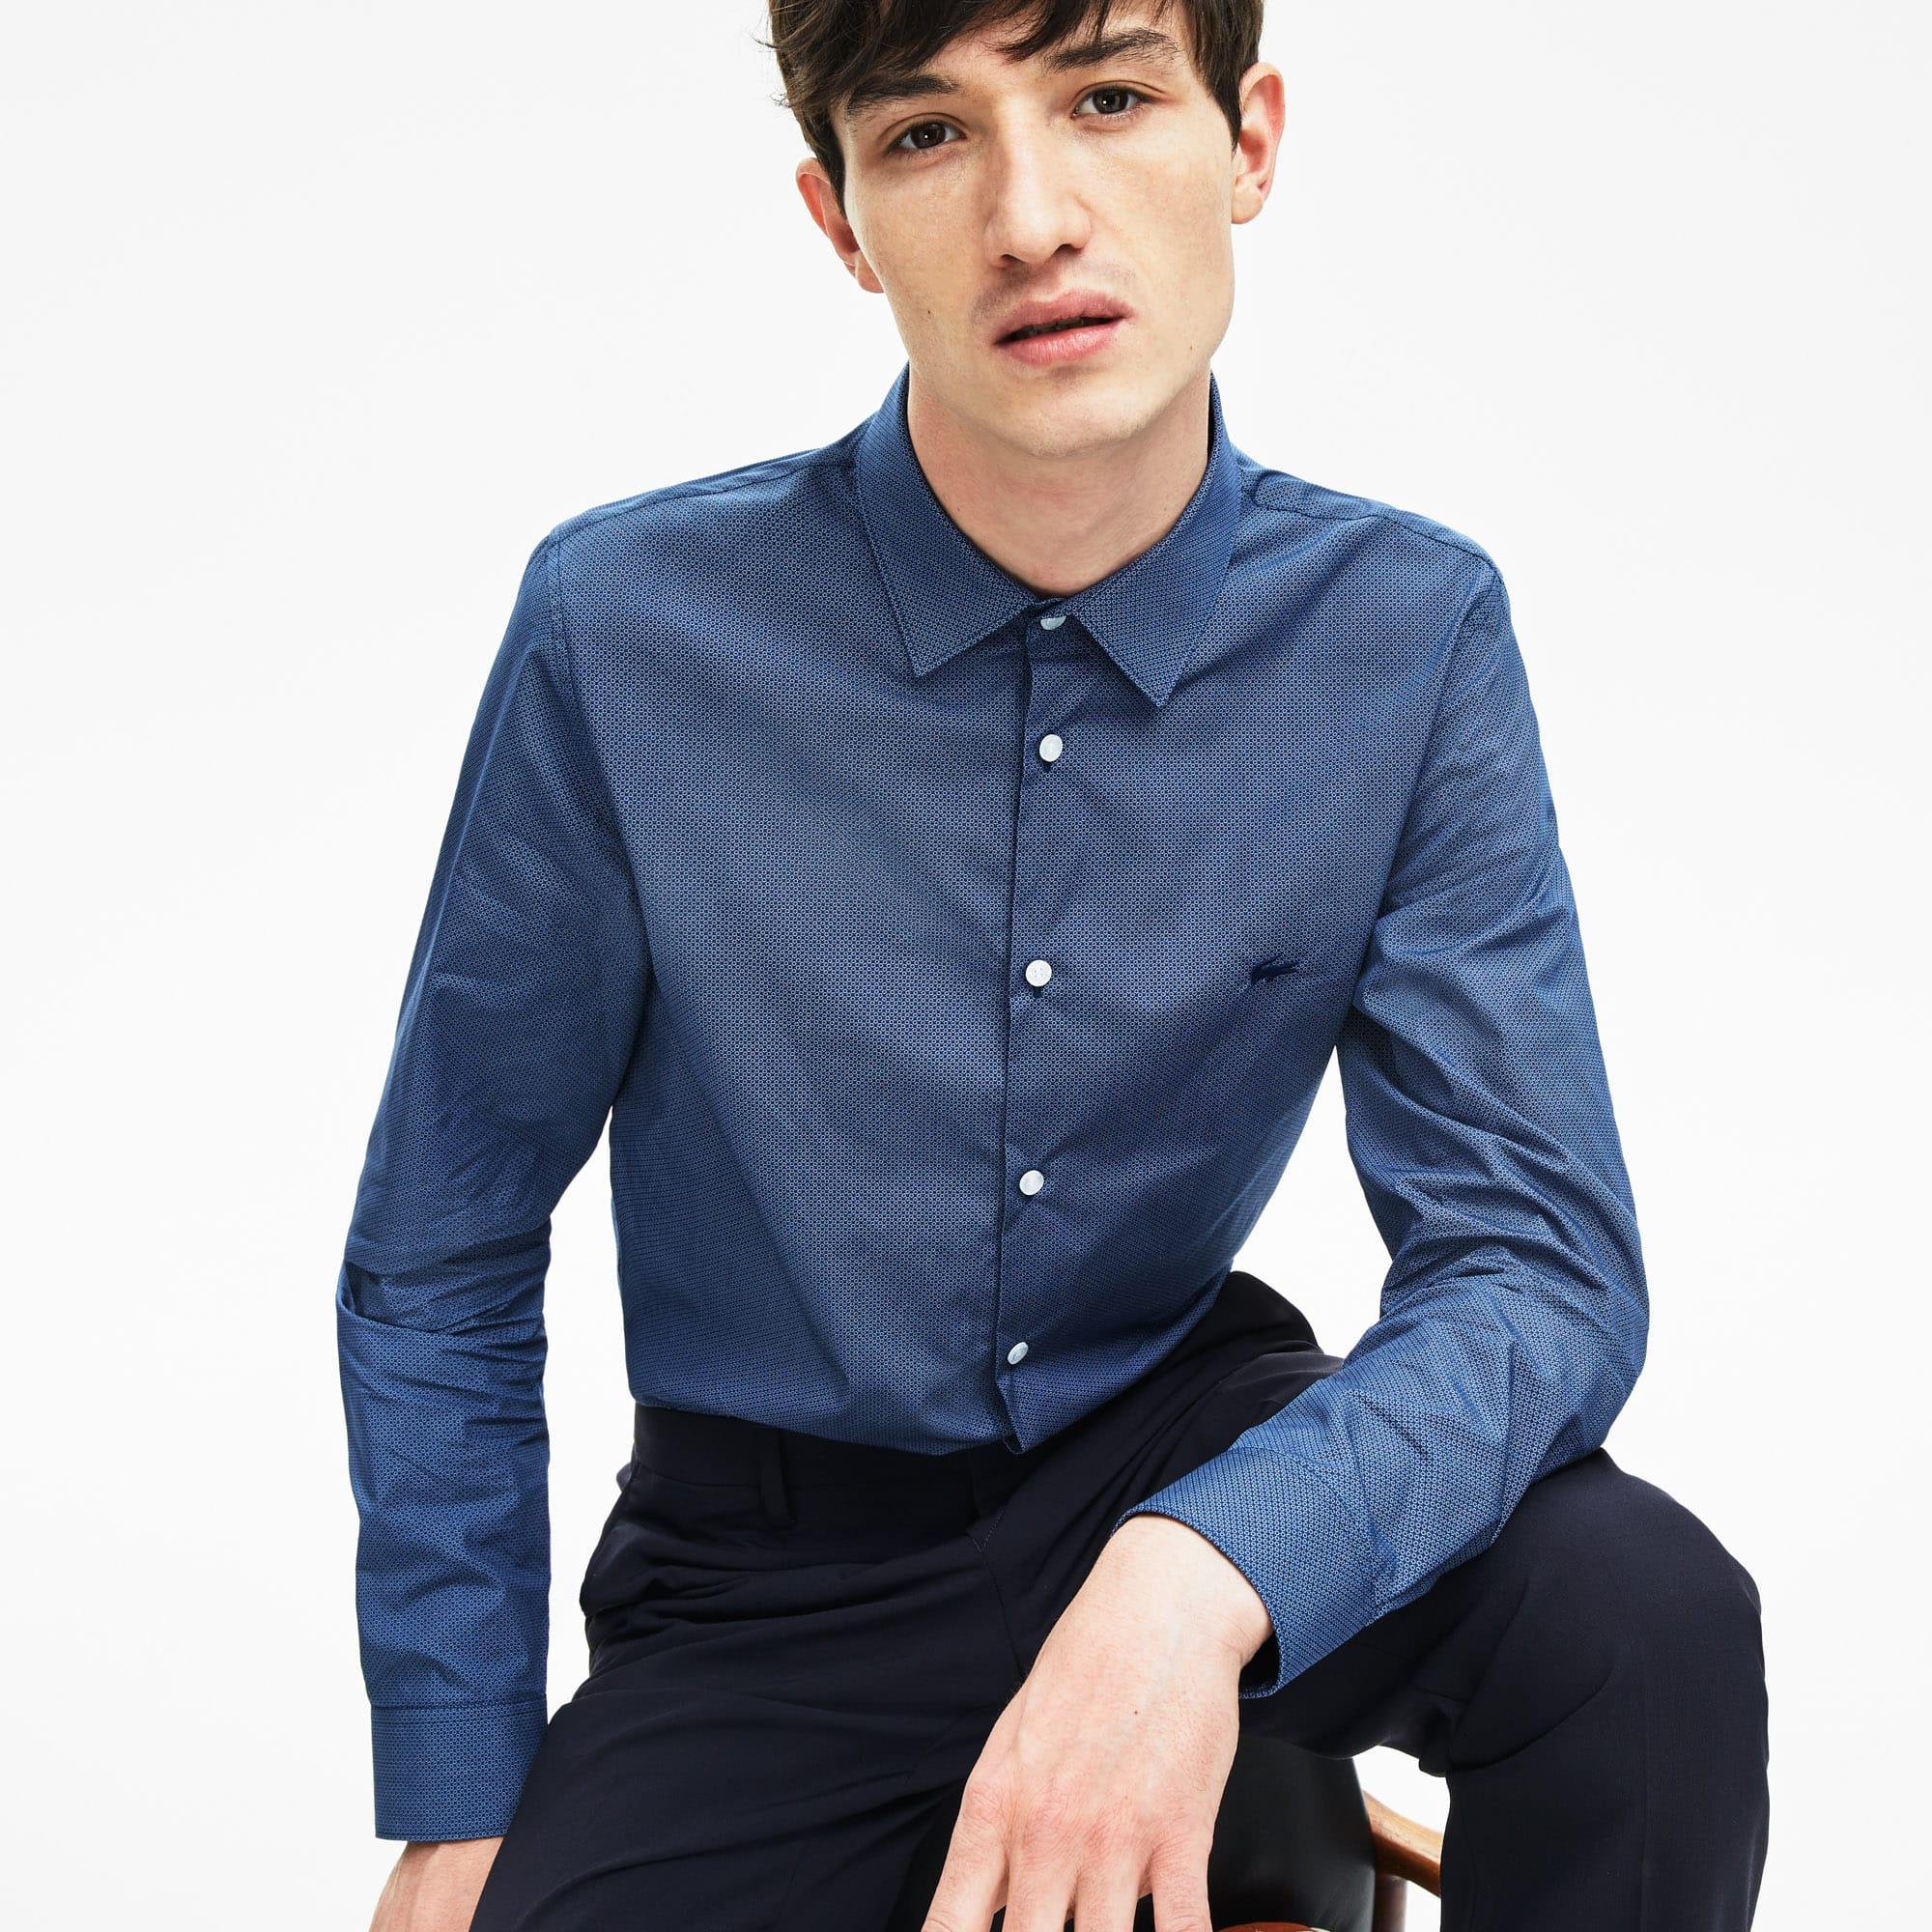 51c824ca504af8 Men's Slim Fit Chest Pocket Print Cotton Poplin Shirt   LACOSTE